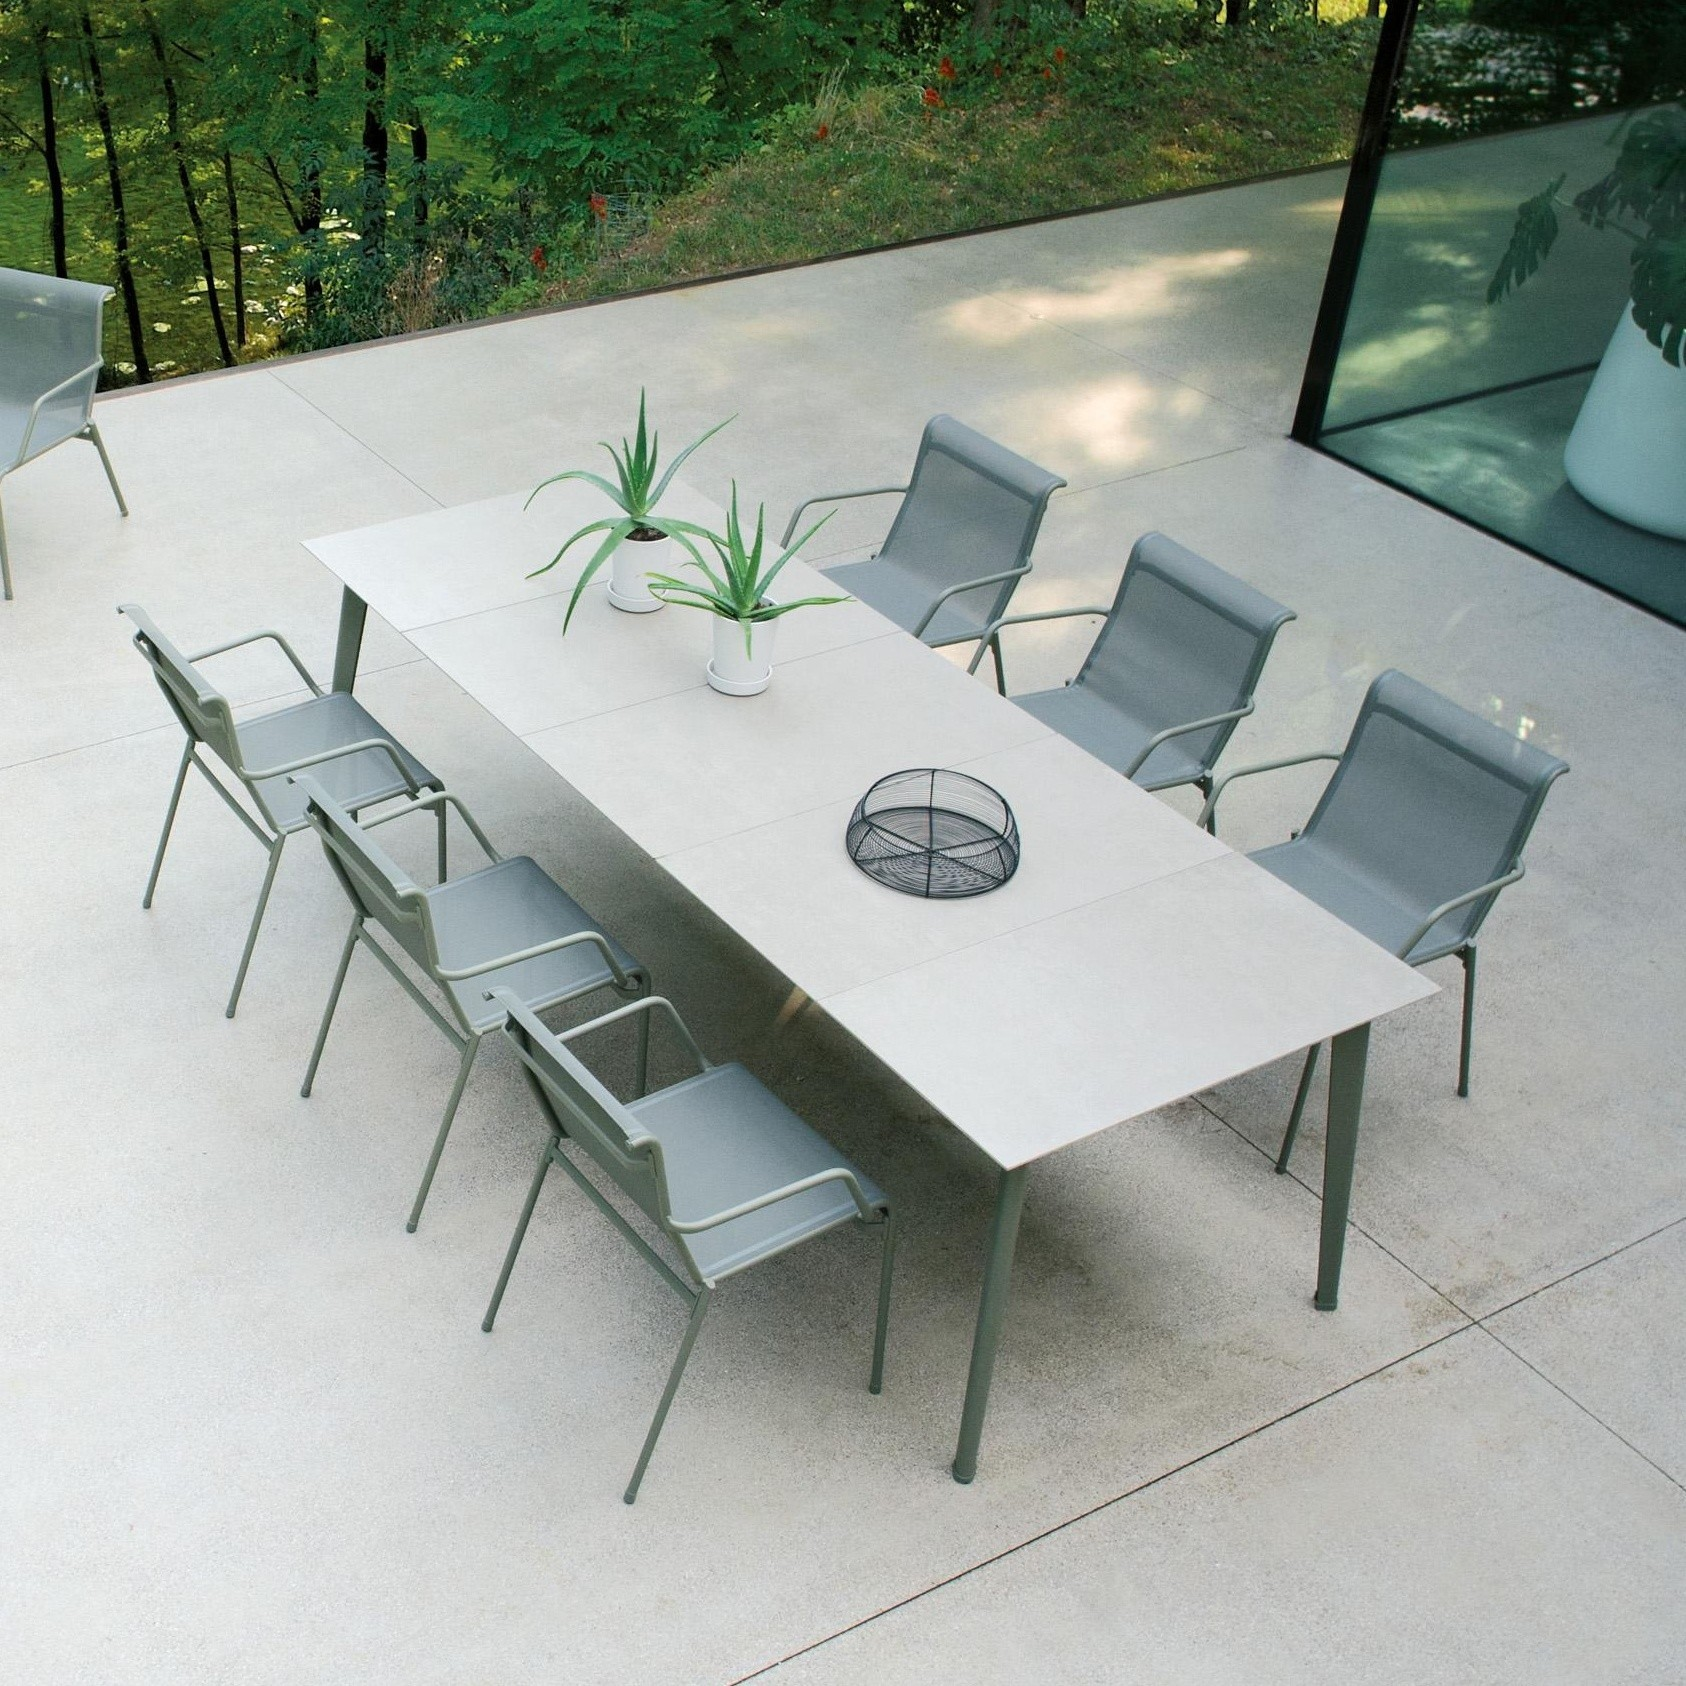 Table de jardin avec allonges Kira